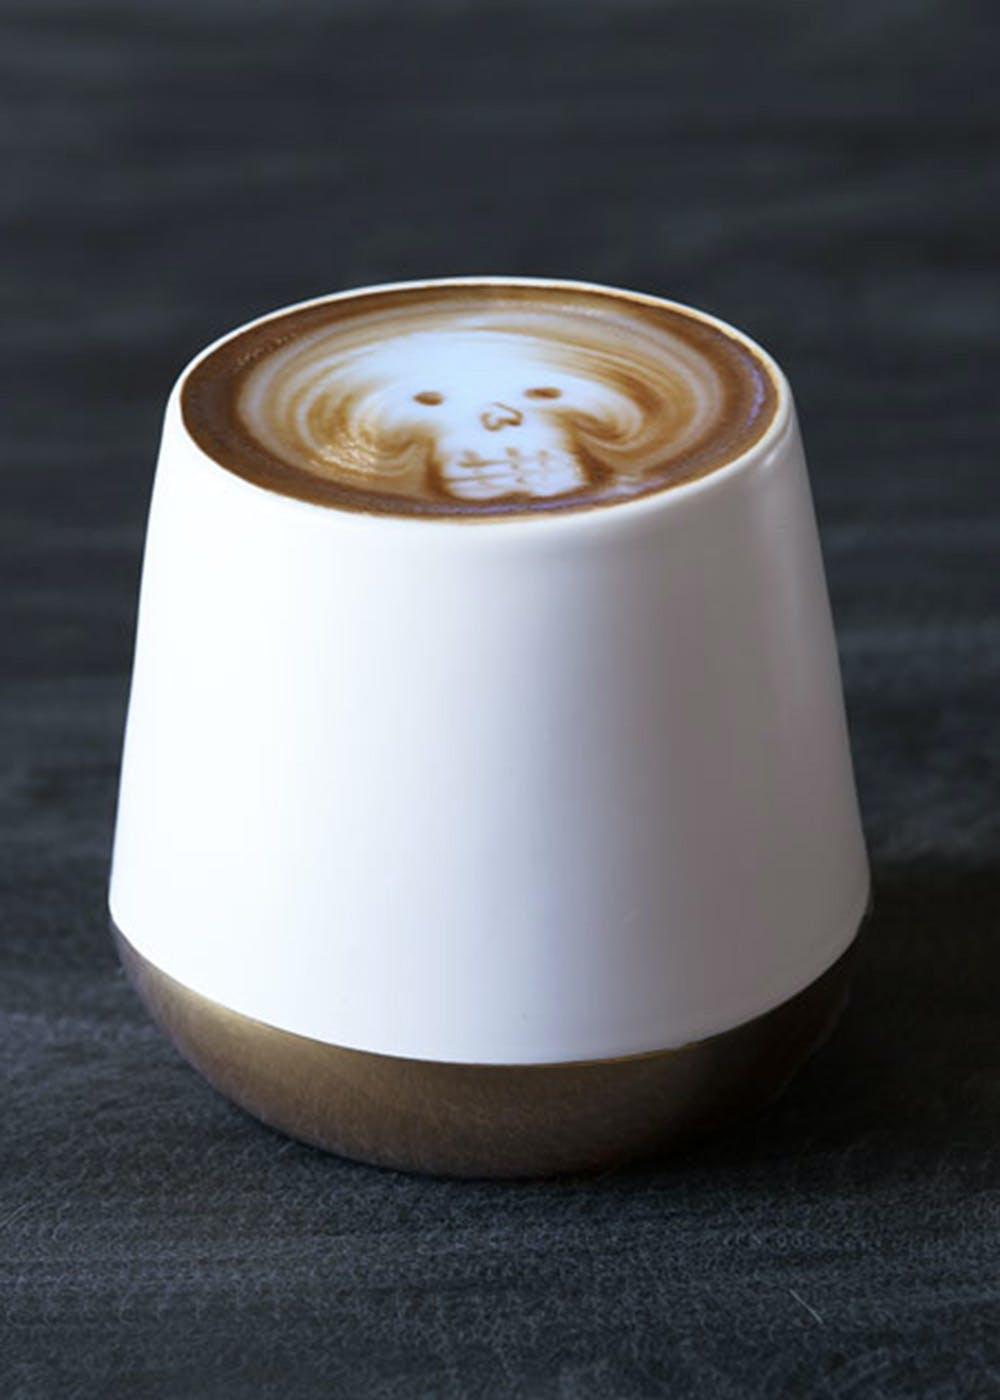 Joey Double Walled Ceramic Mug